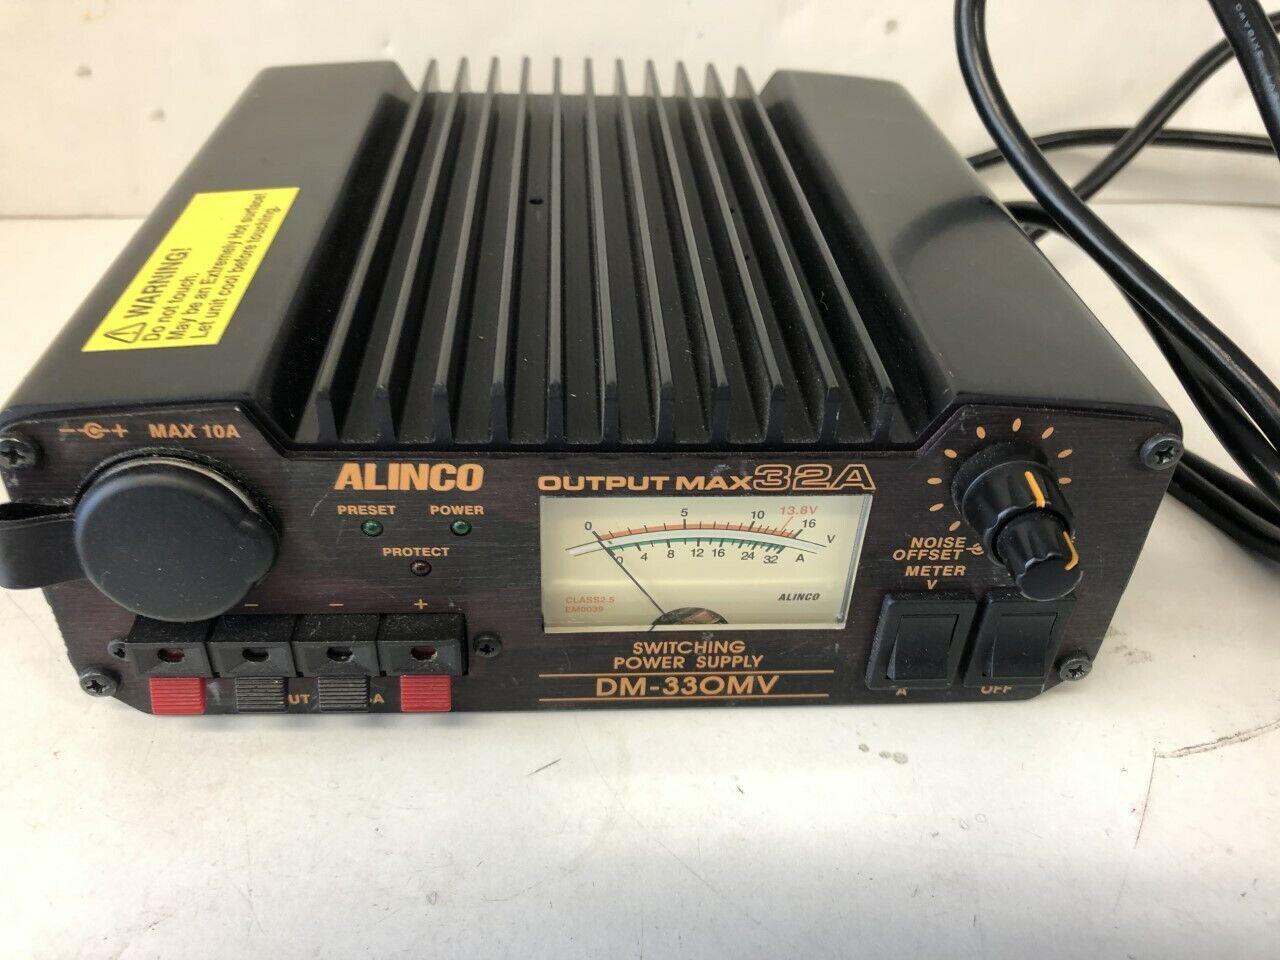 Alinco Dc Stabilized Power Supply Switching Type 32A Dm-330 Mv F//S w//Tracking#